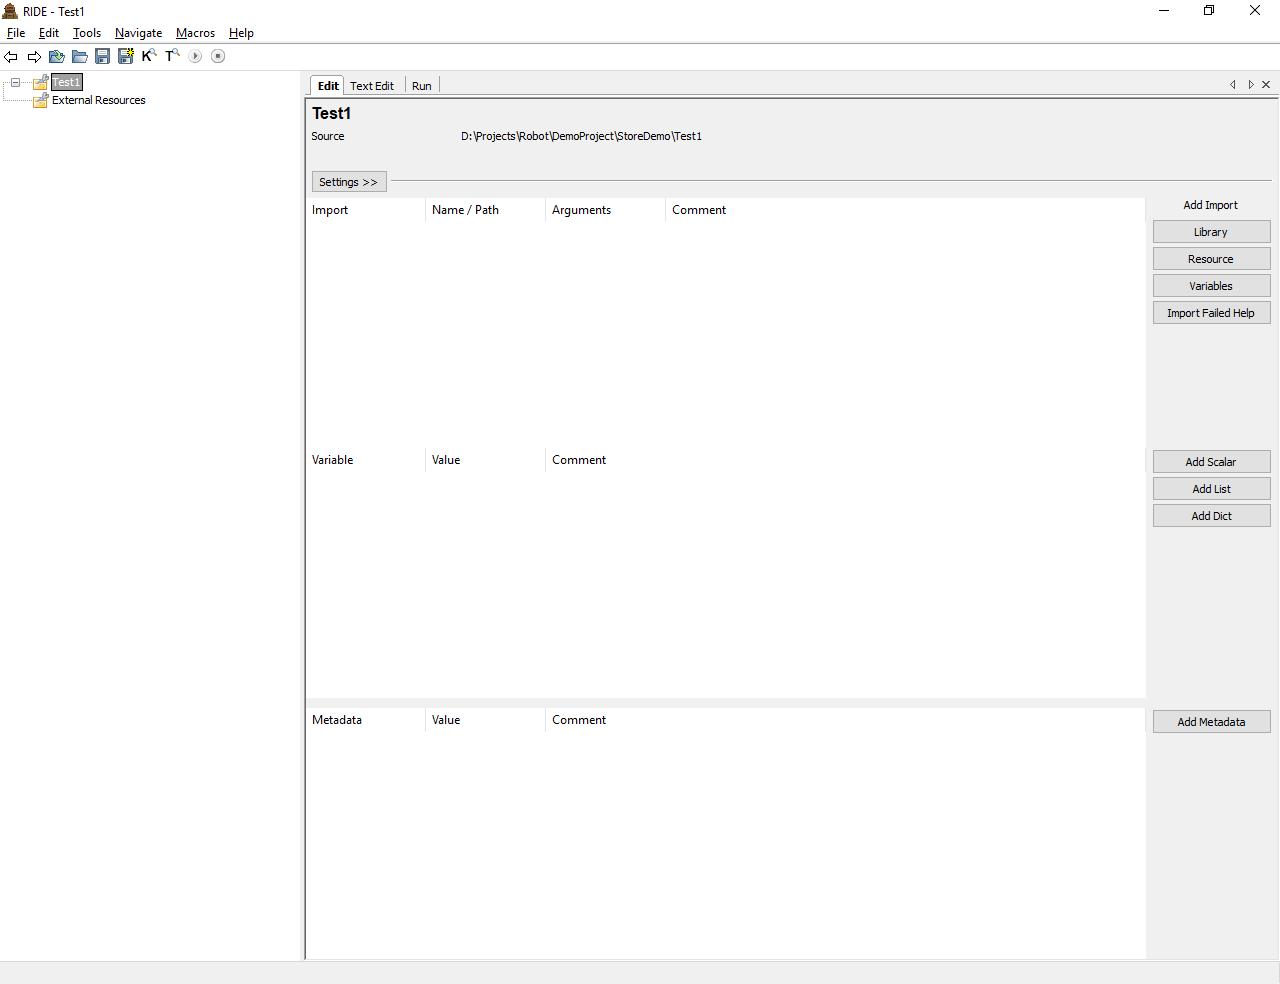 RIDE (Robot IDE) interface